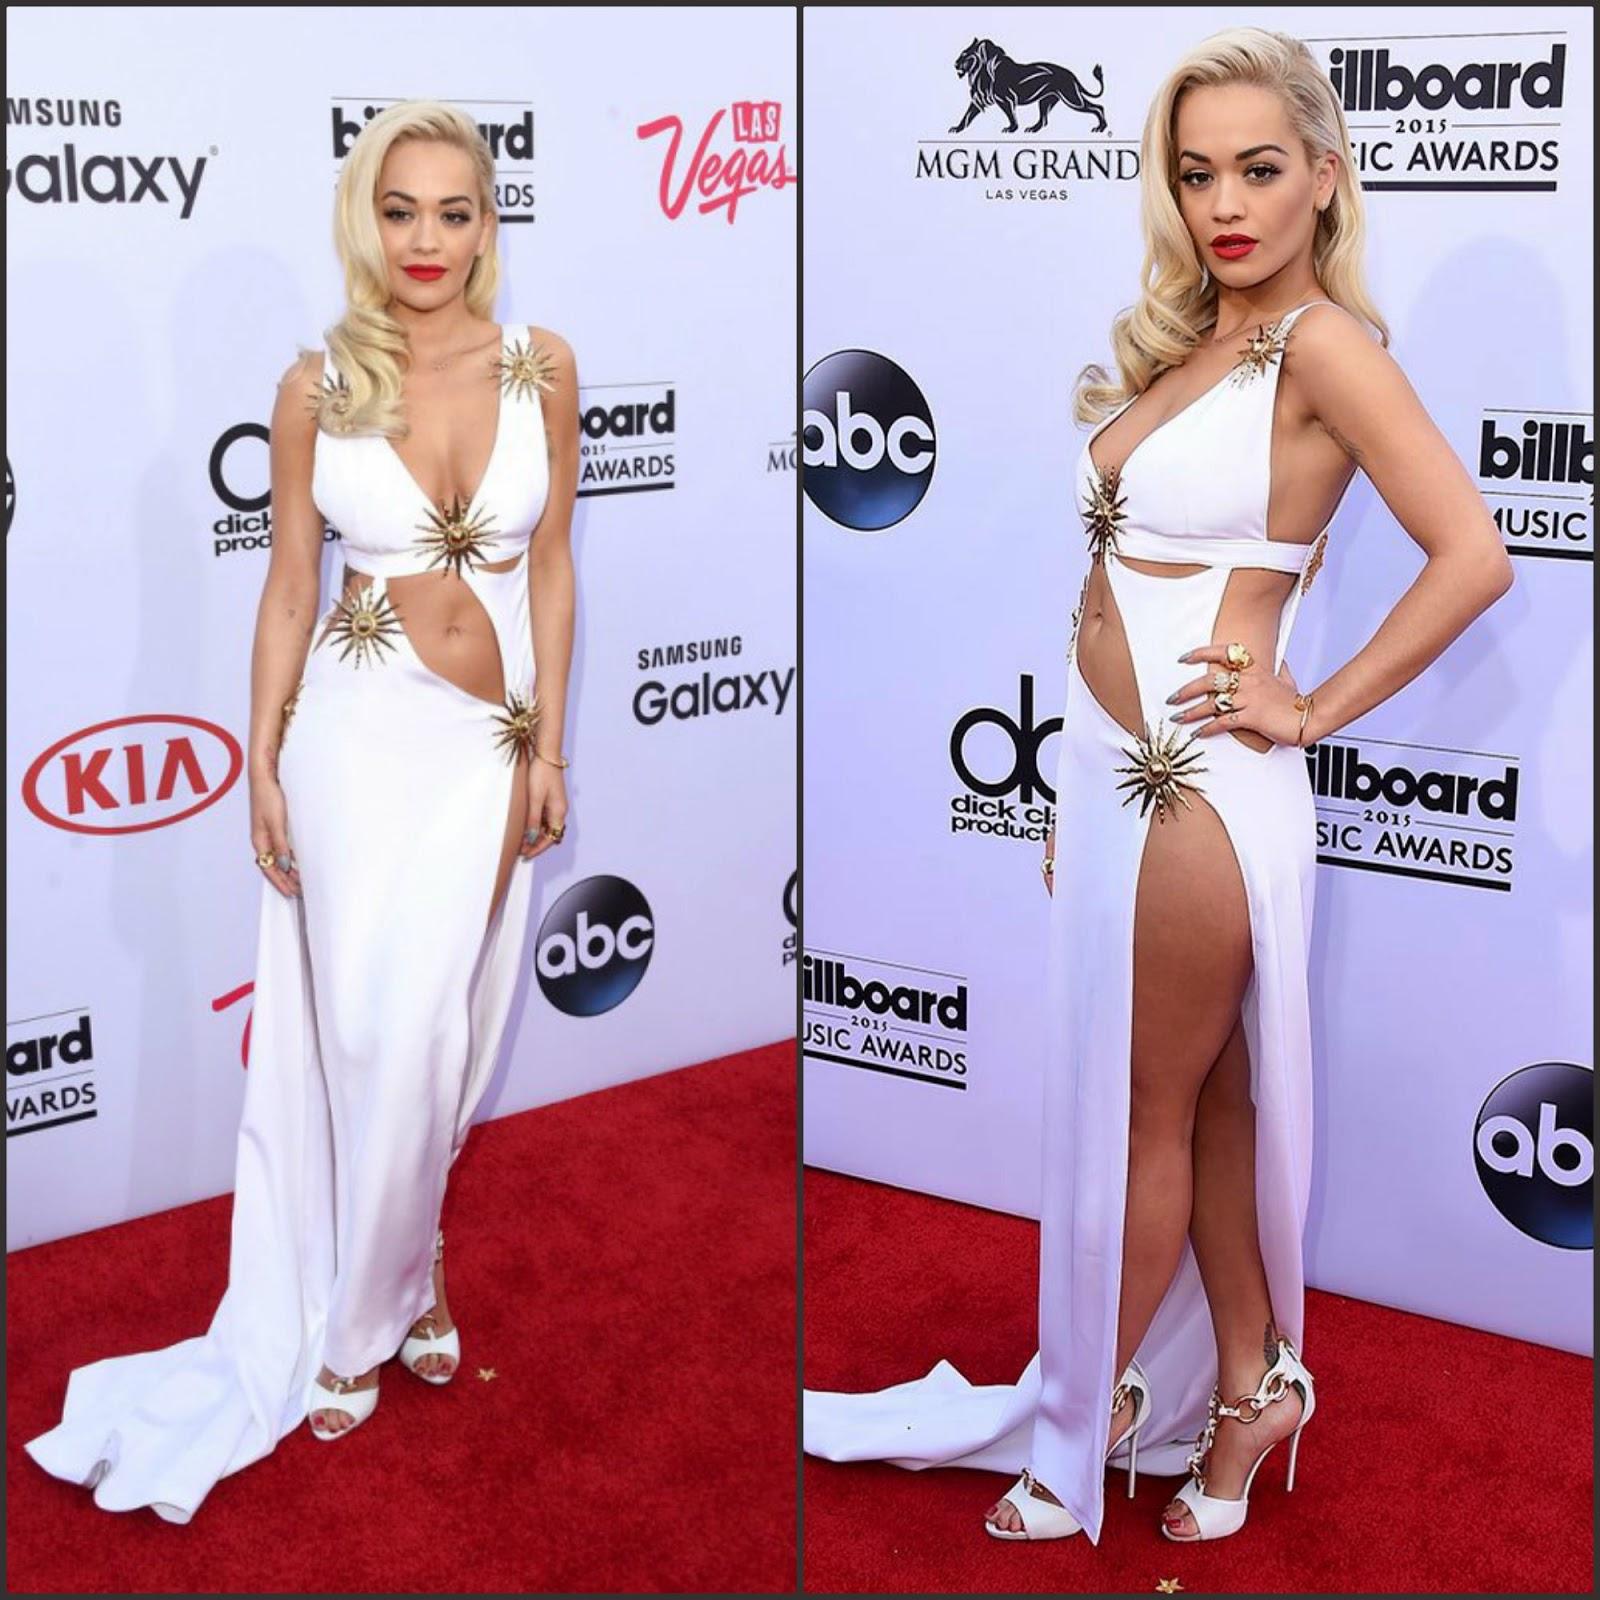 Gymnast Katelyn Ohashi S Espy Awards Speech: The Yellow Party News: Rita Ora Wears Risky Dress On